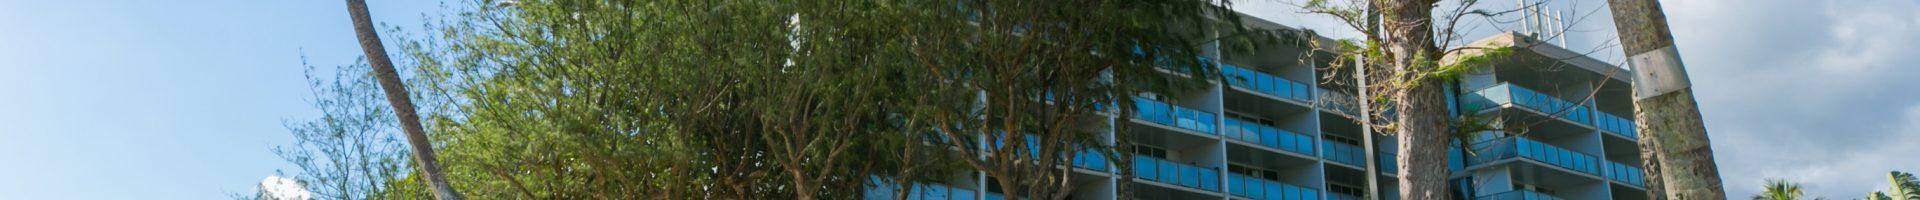 HAUULA | 53-549 KAMEHAMEHA HWY, #201